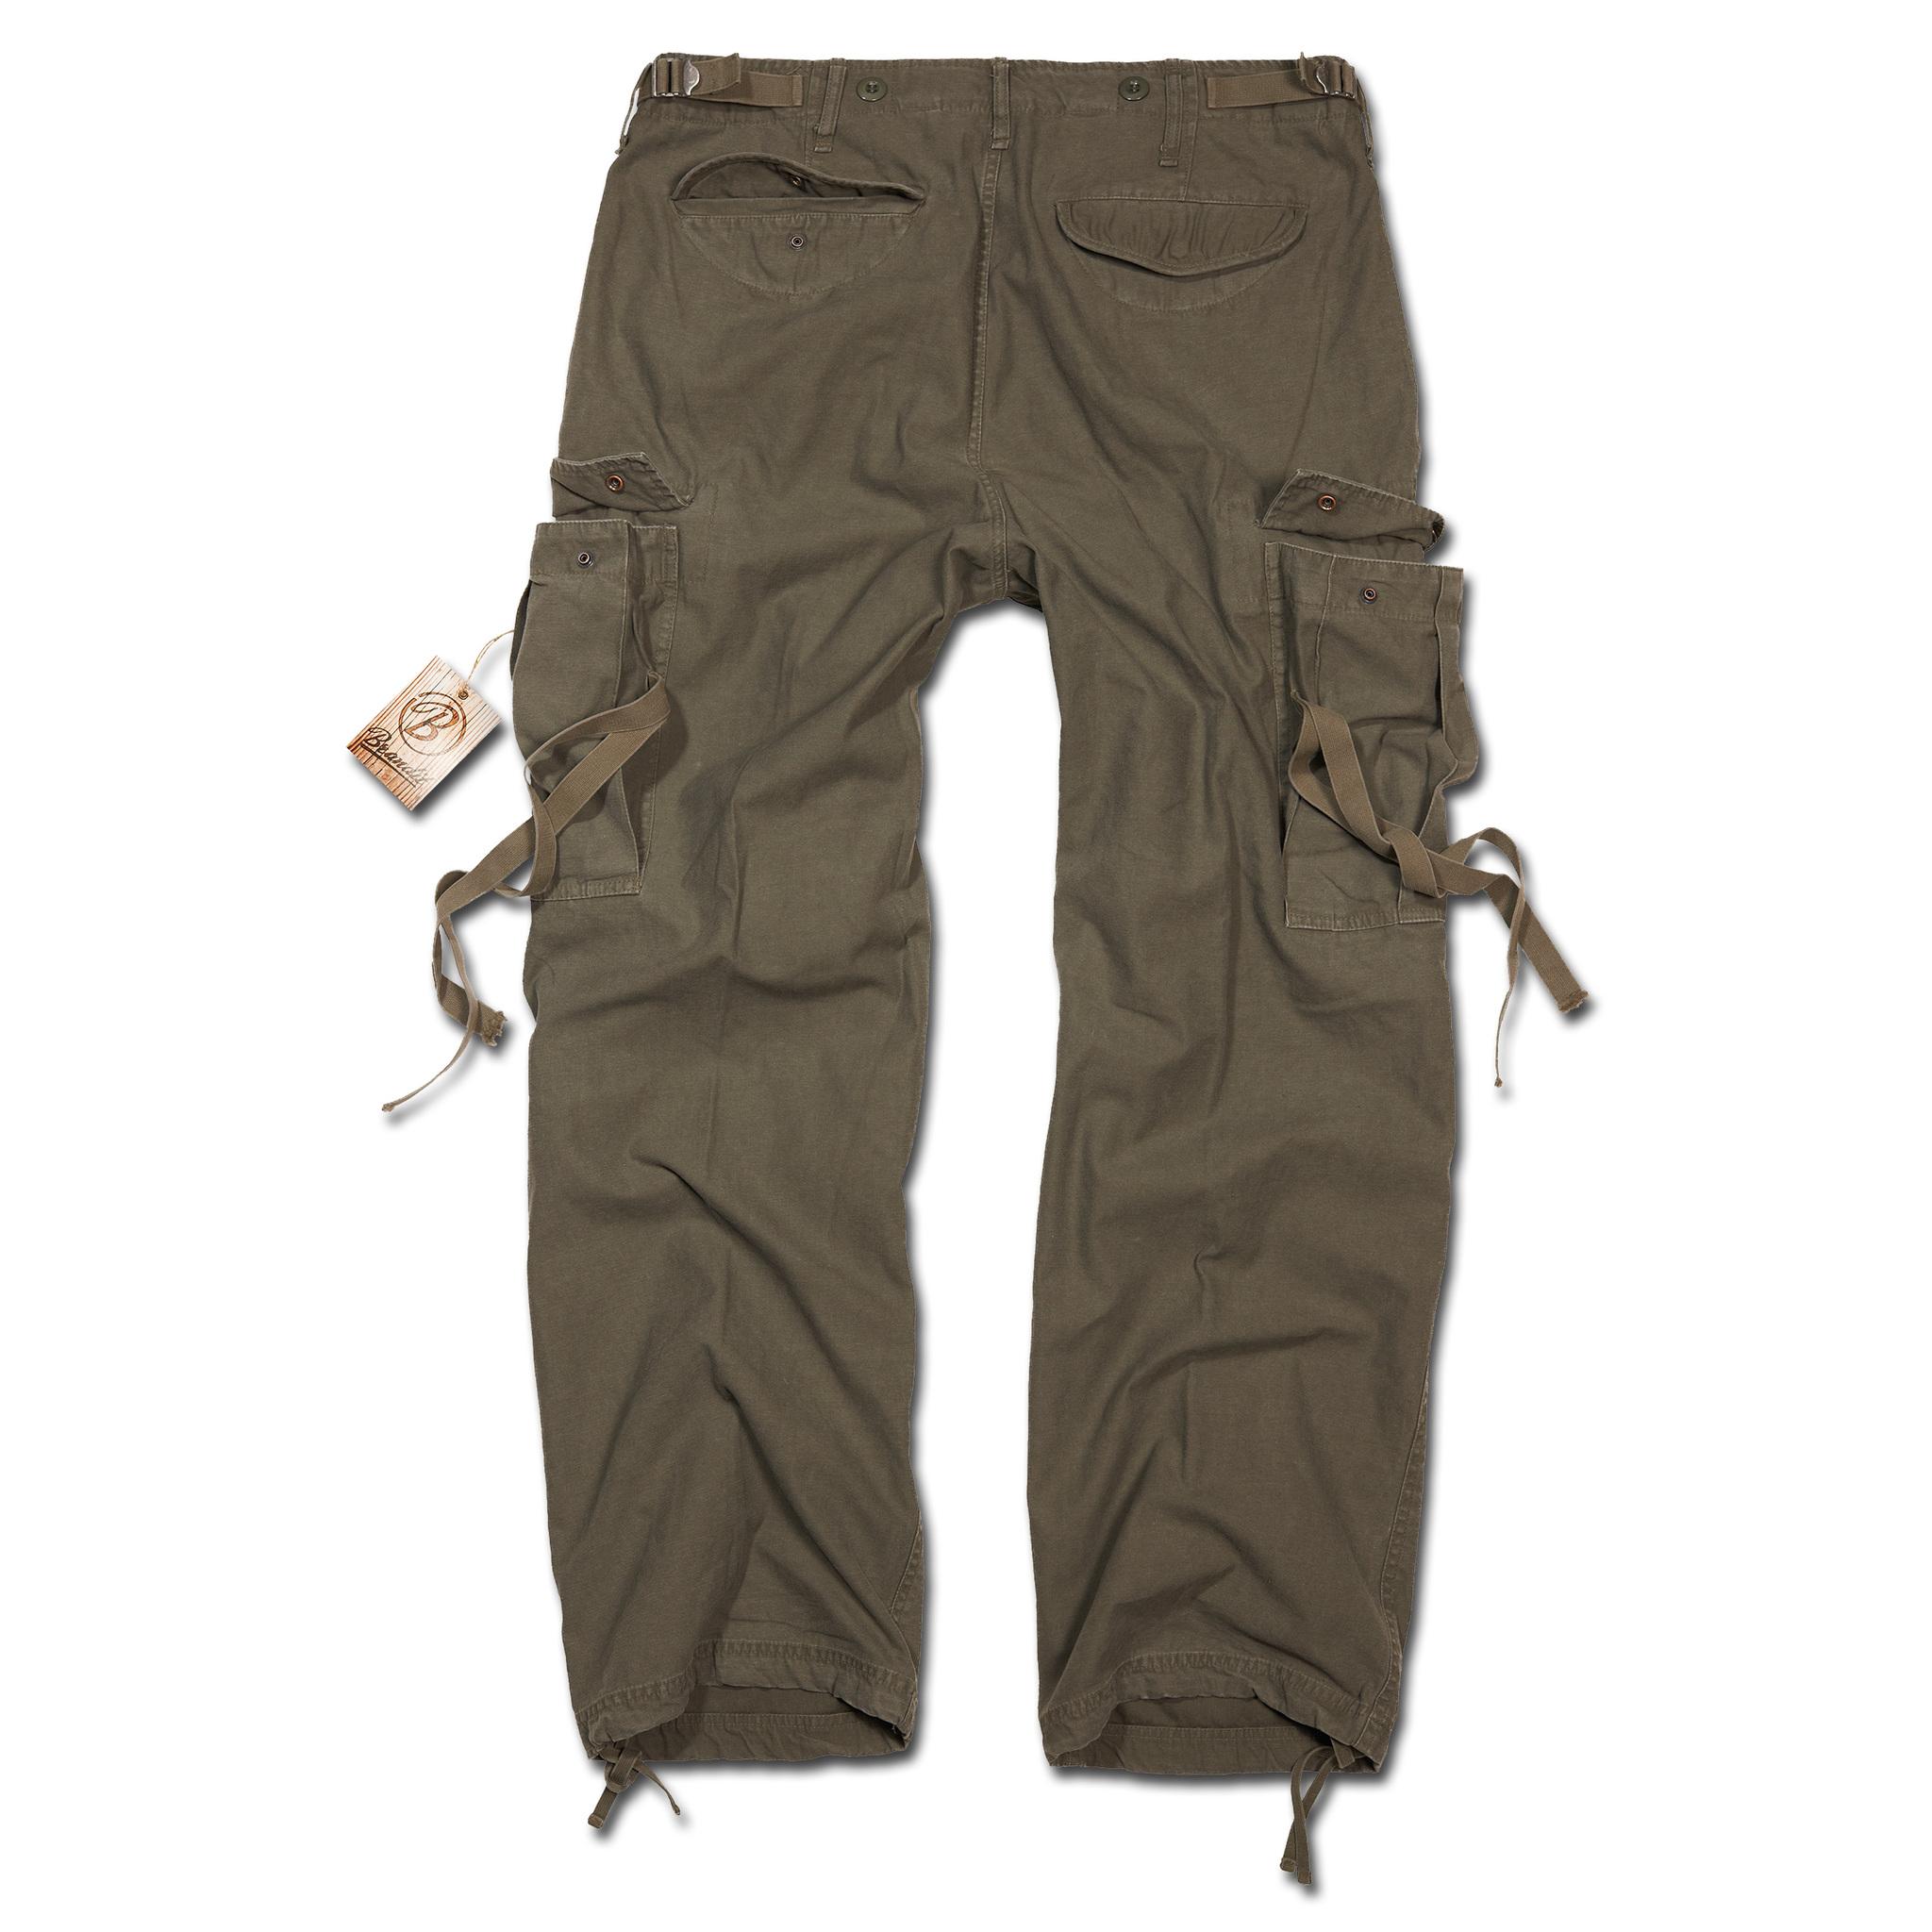 Vintage брюки доставка